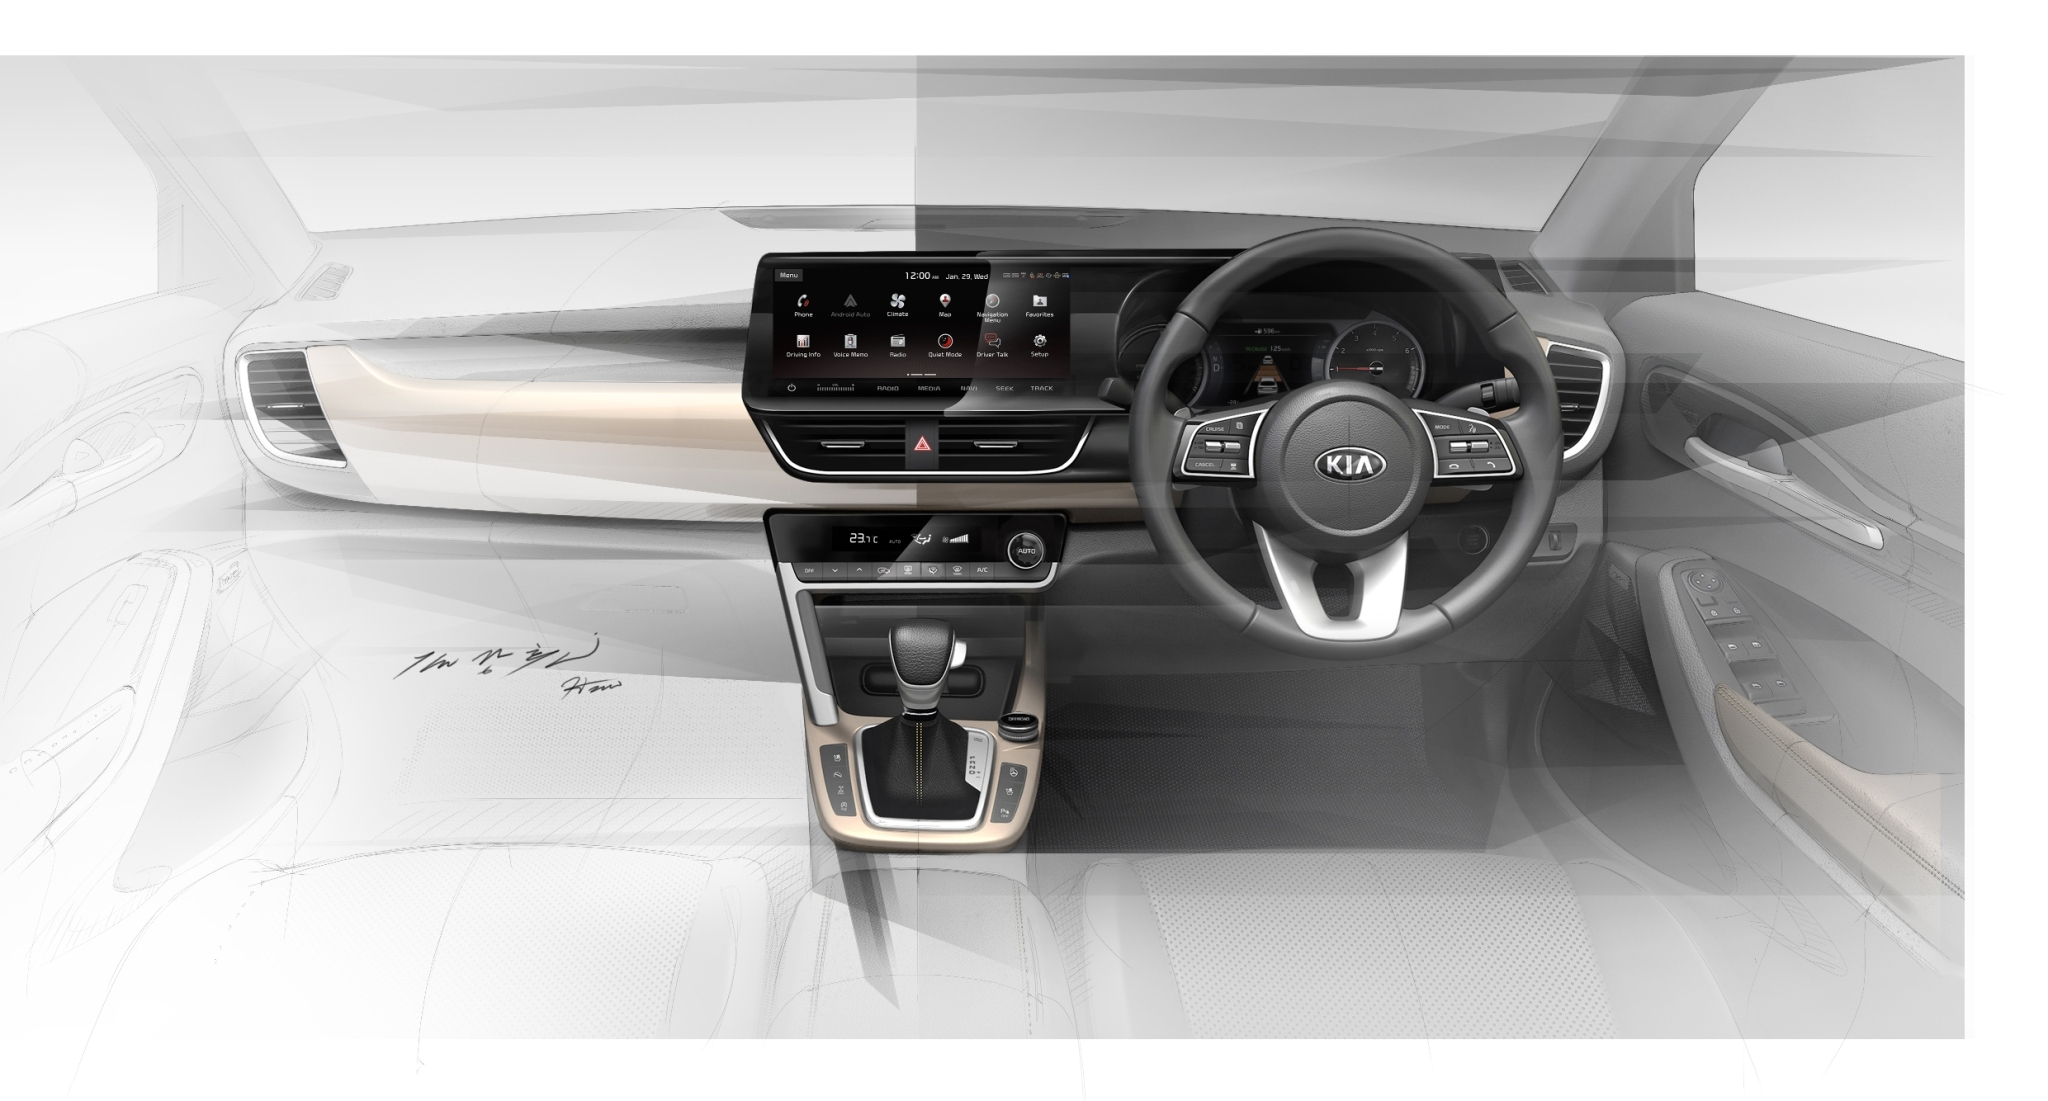 Upcoming 2019 Kia SP SUV Interiors Revealed via Sketches